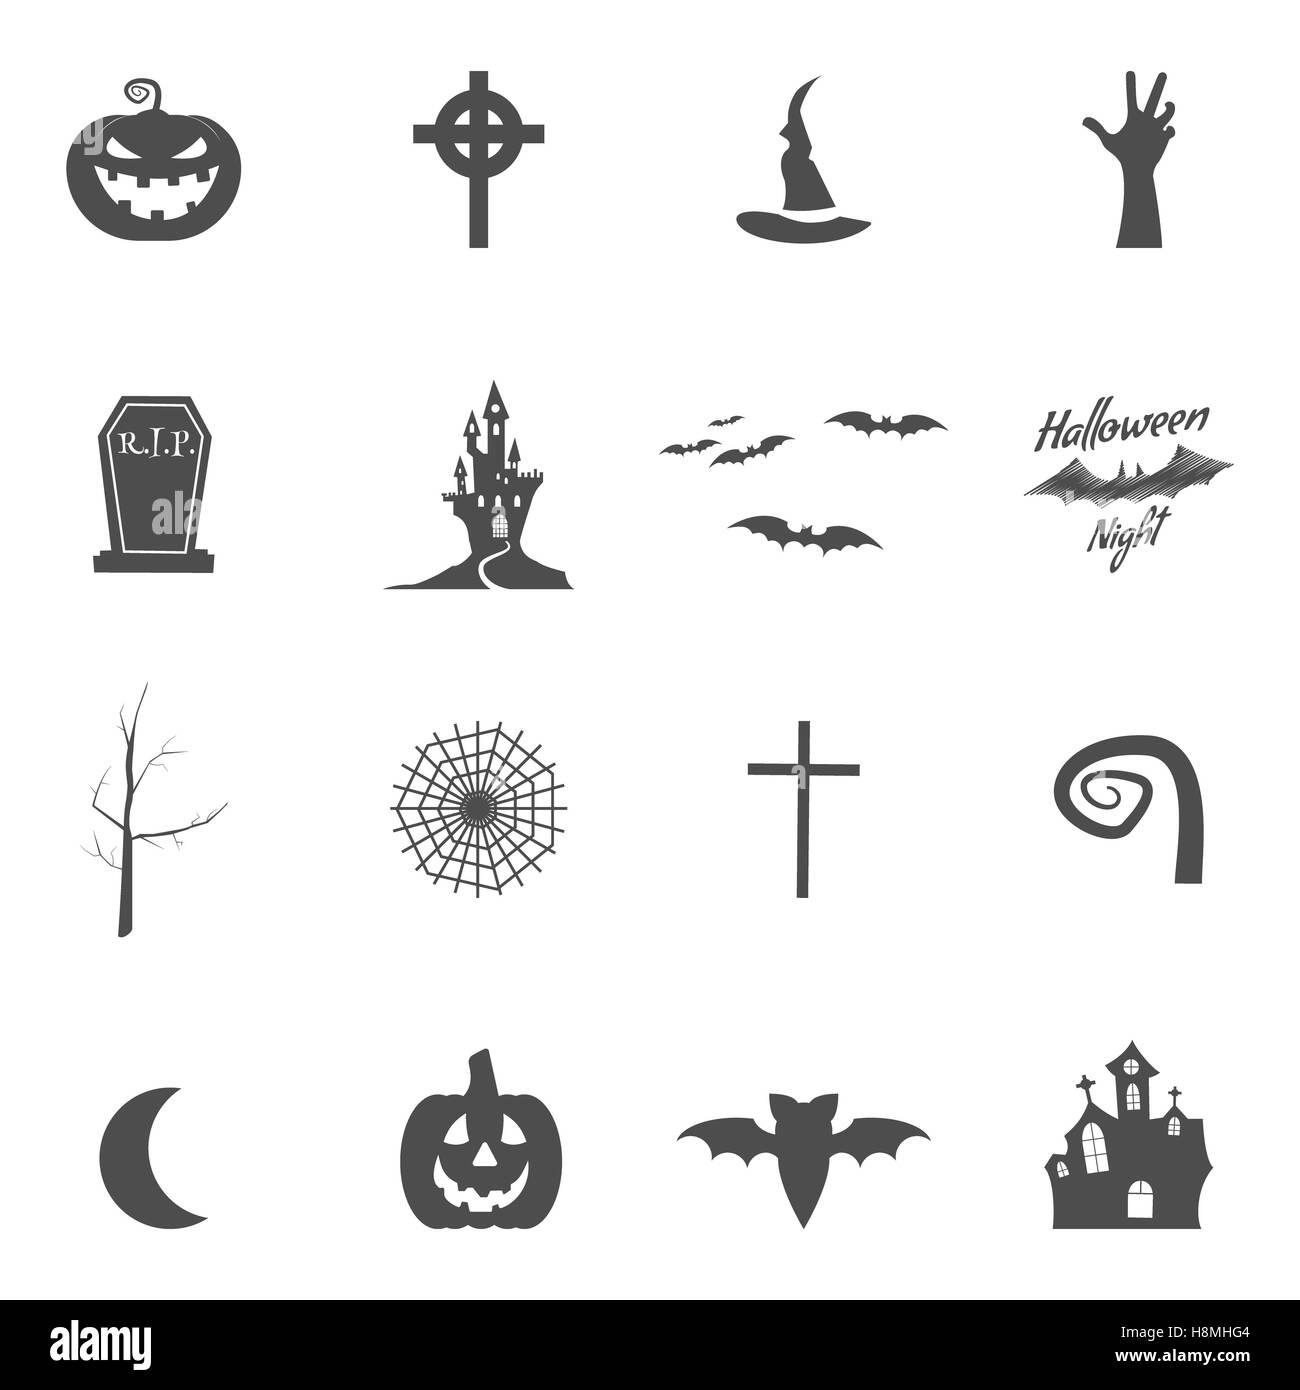 Set Of Halloween Design Creation Tool Kit Icons Isolate Silhouette